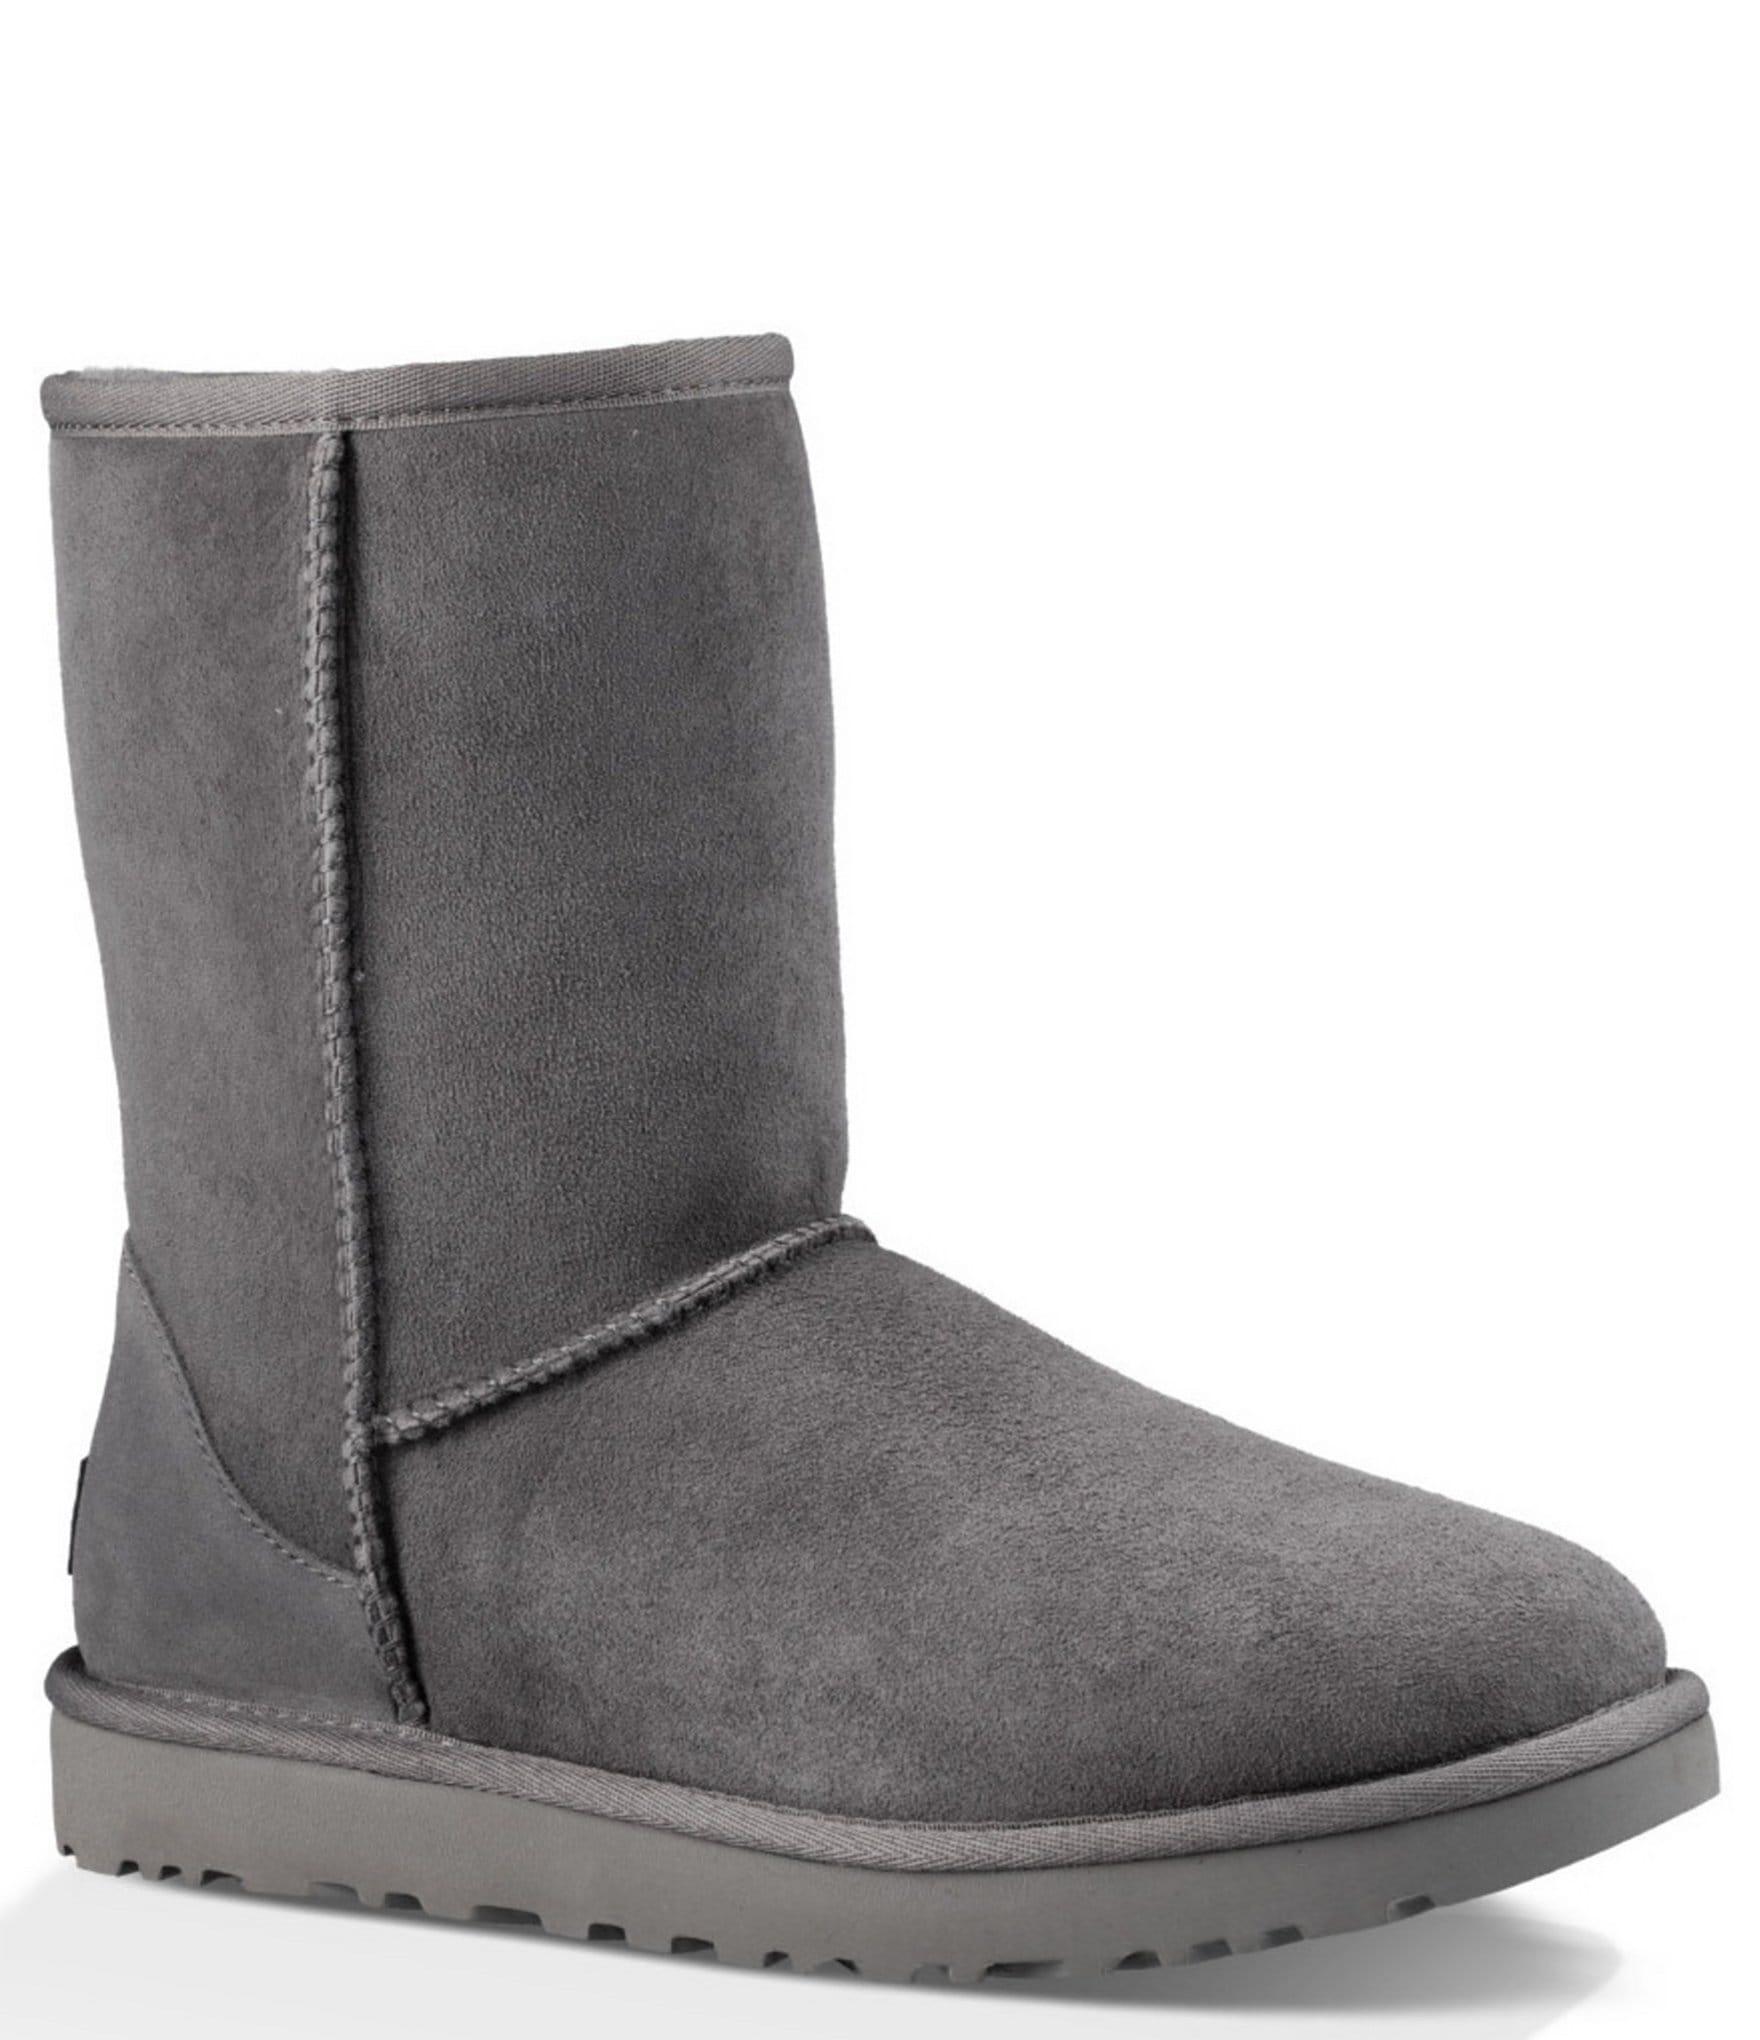 90554ef6e267 UGG Women s Shoes